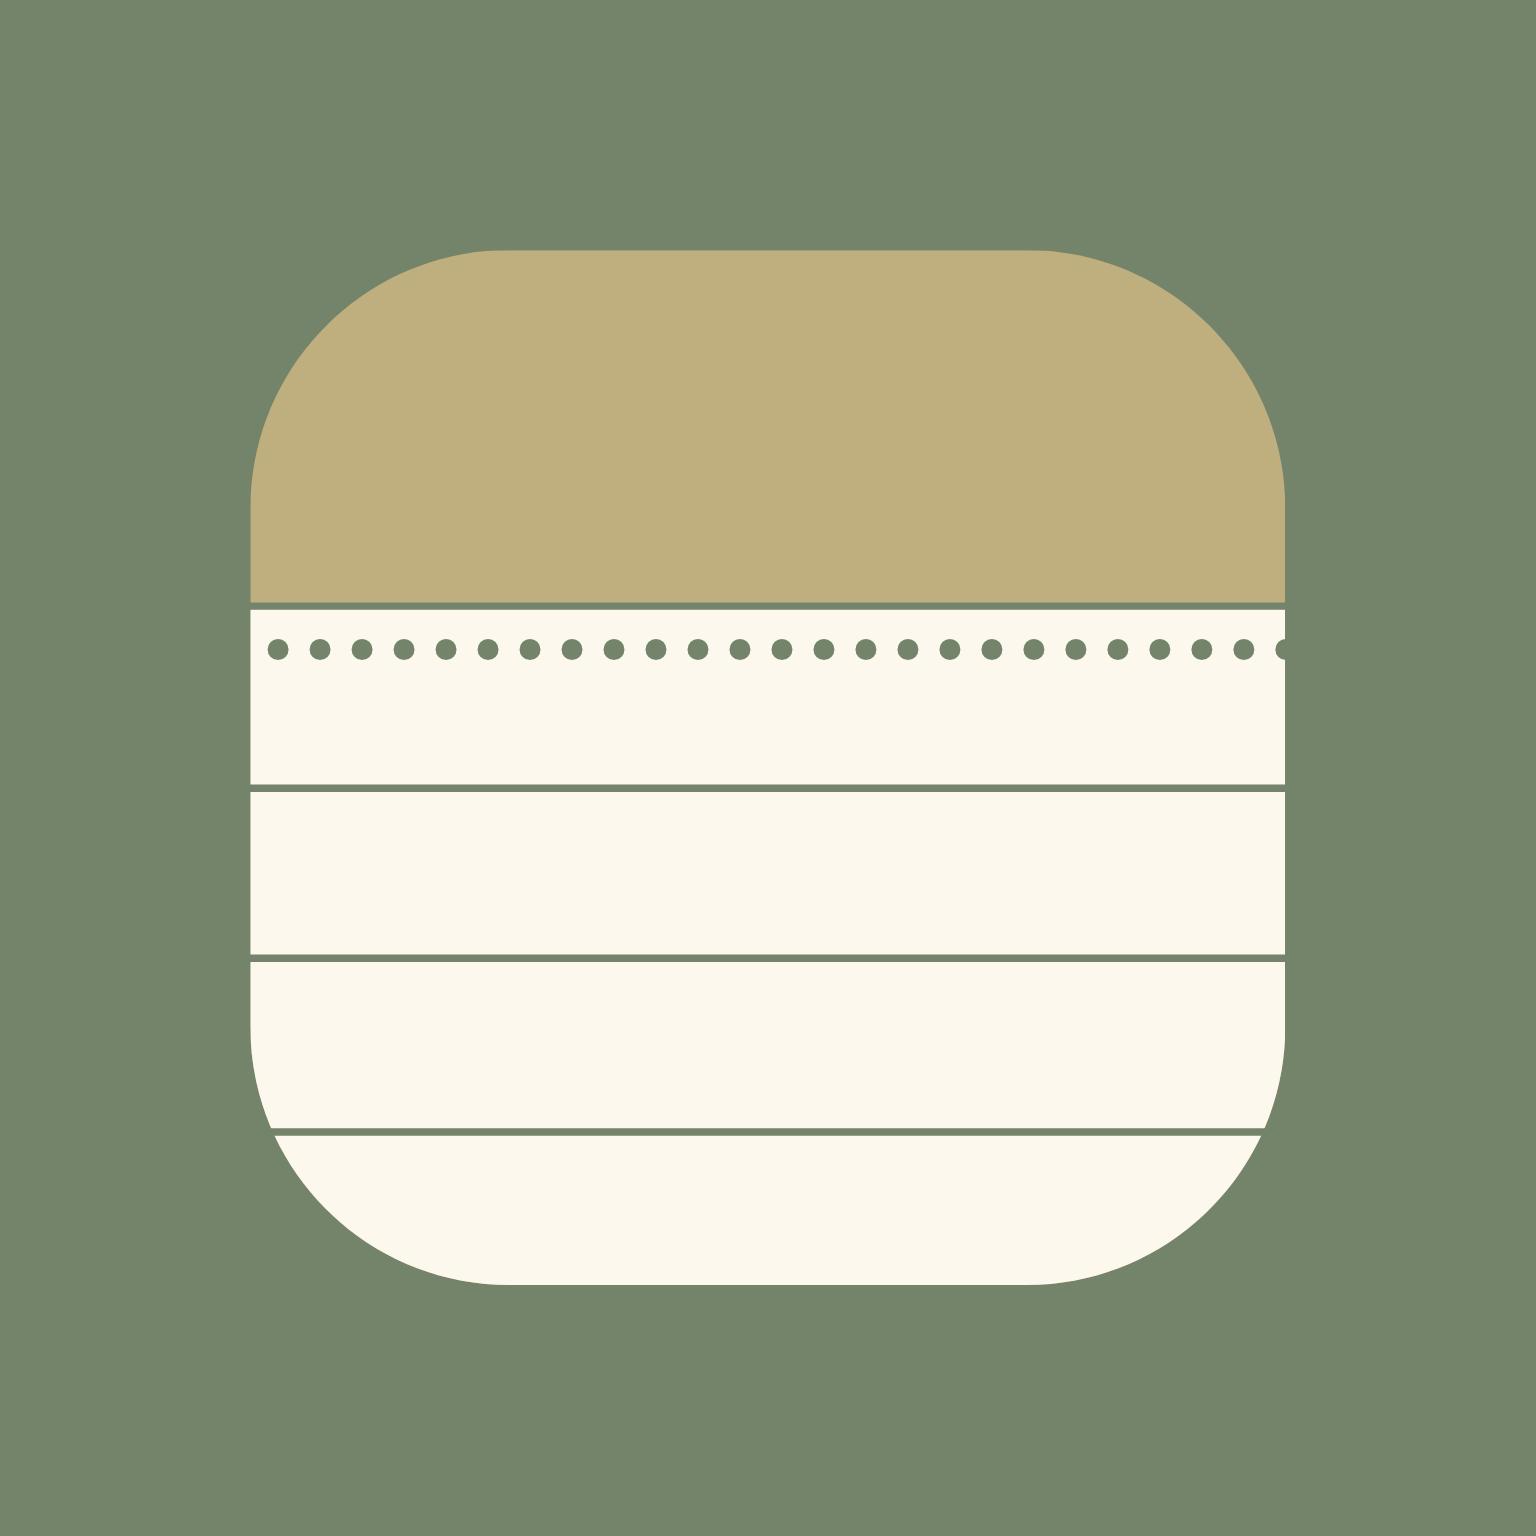 Notes App Icon In 2021 App Icon Ios App Icon Design Iphone App Design